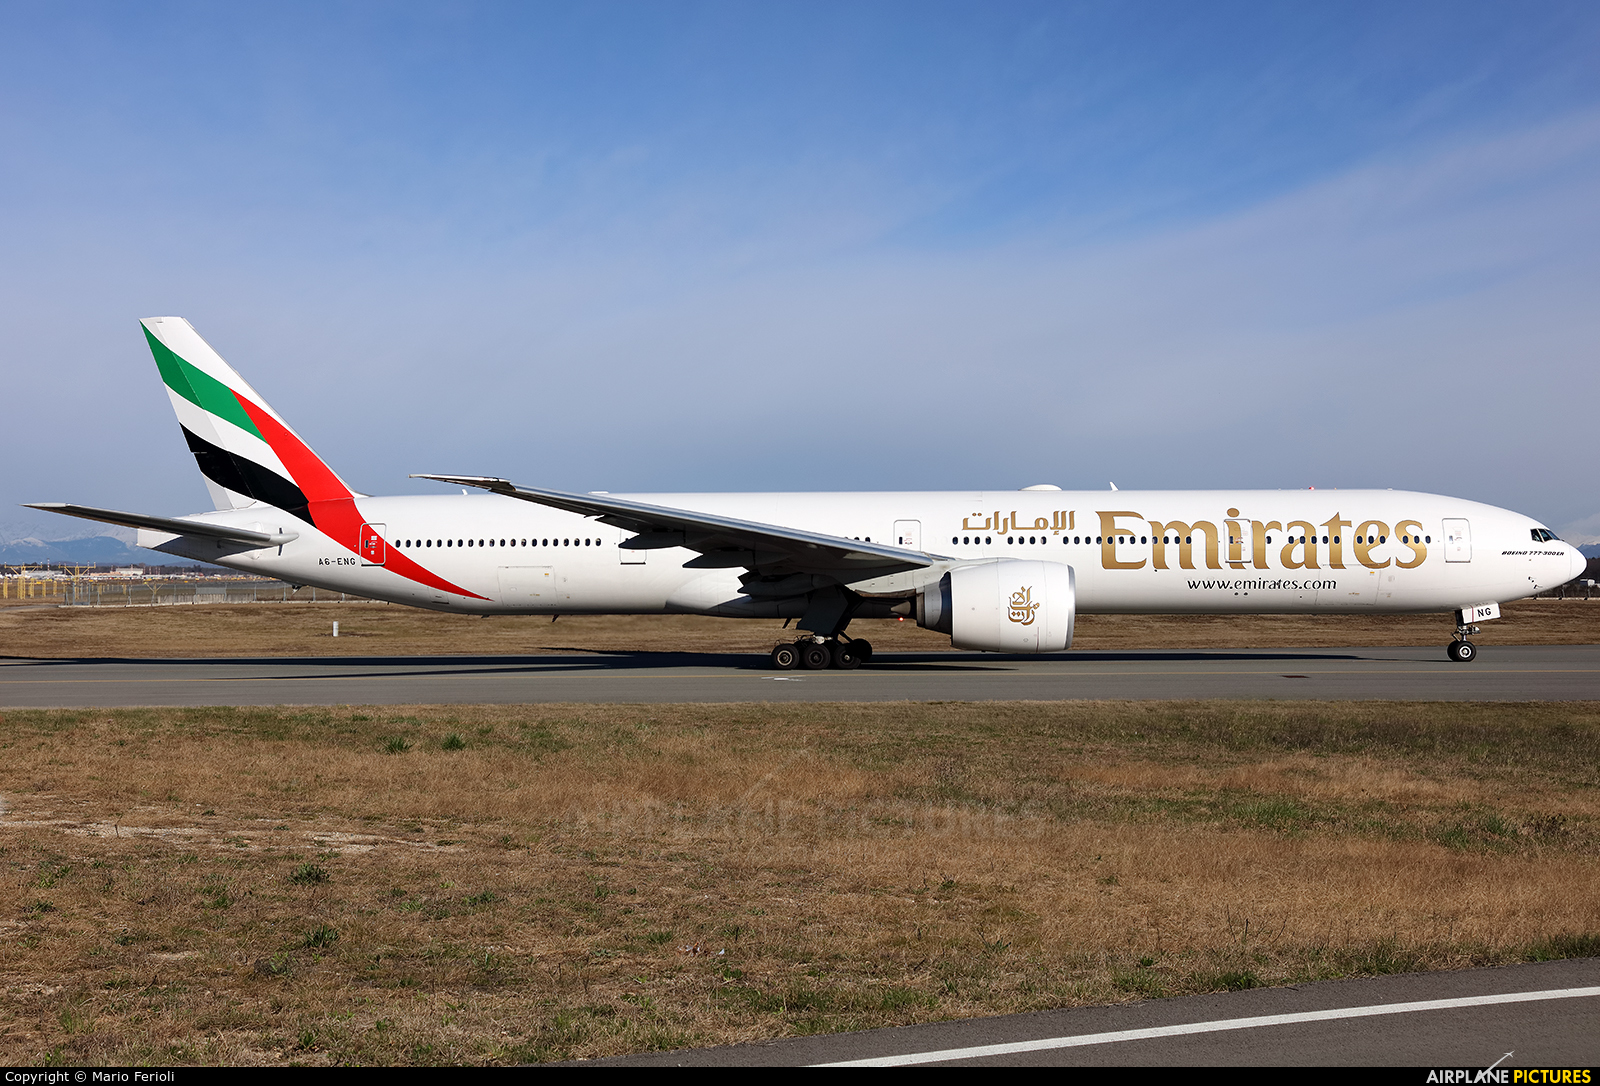 Emirates Airlines A6-ENG aircraft at Milan - Malpensa